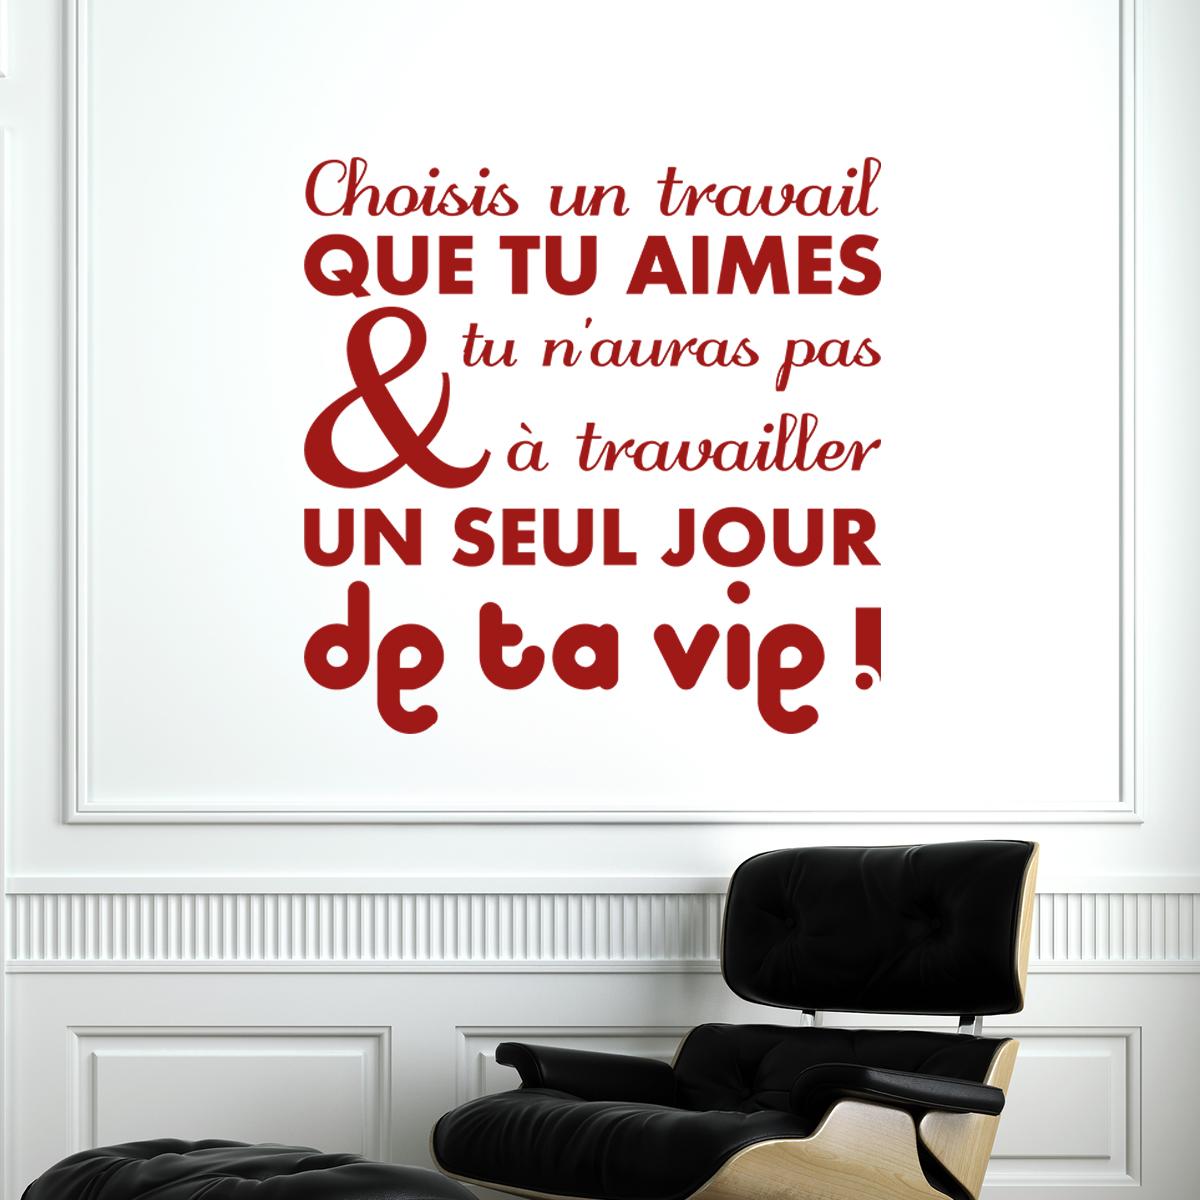 Sticker Citation Choisis Un Travail Que Tu Aimes